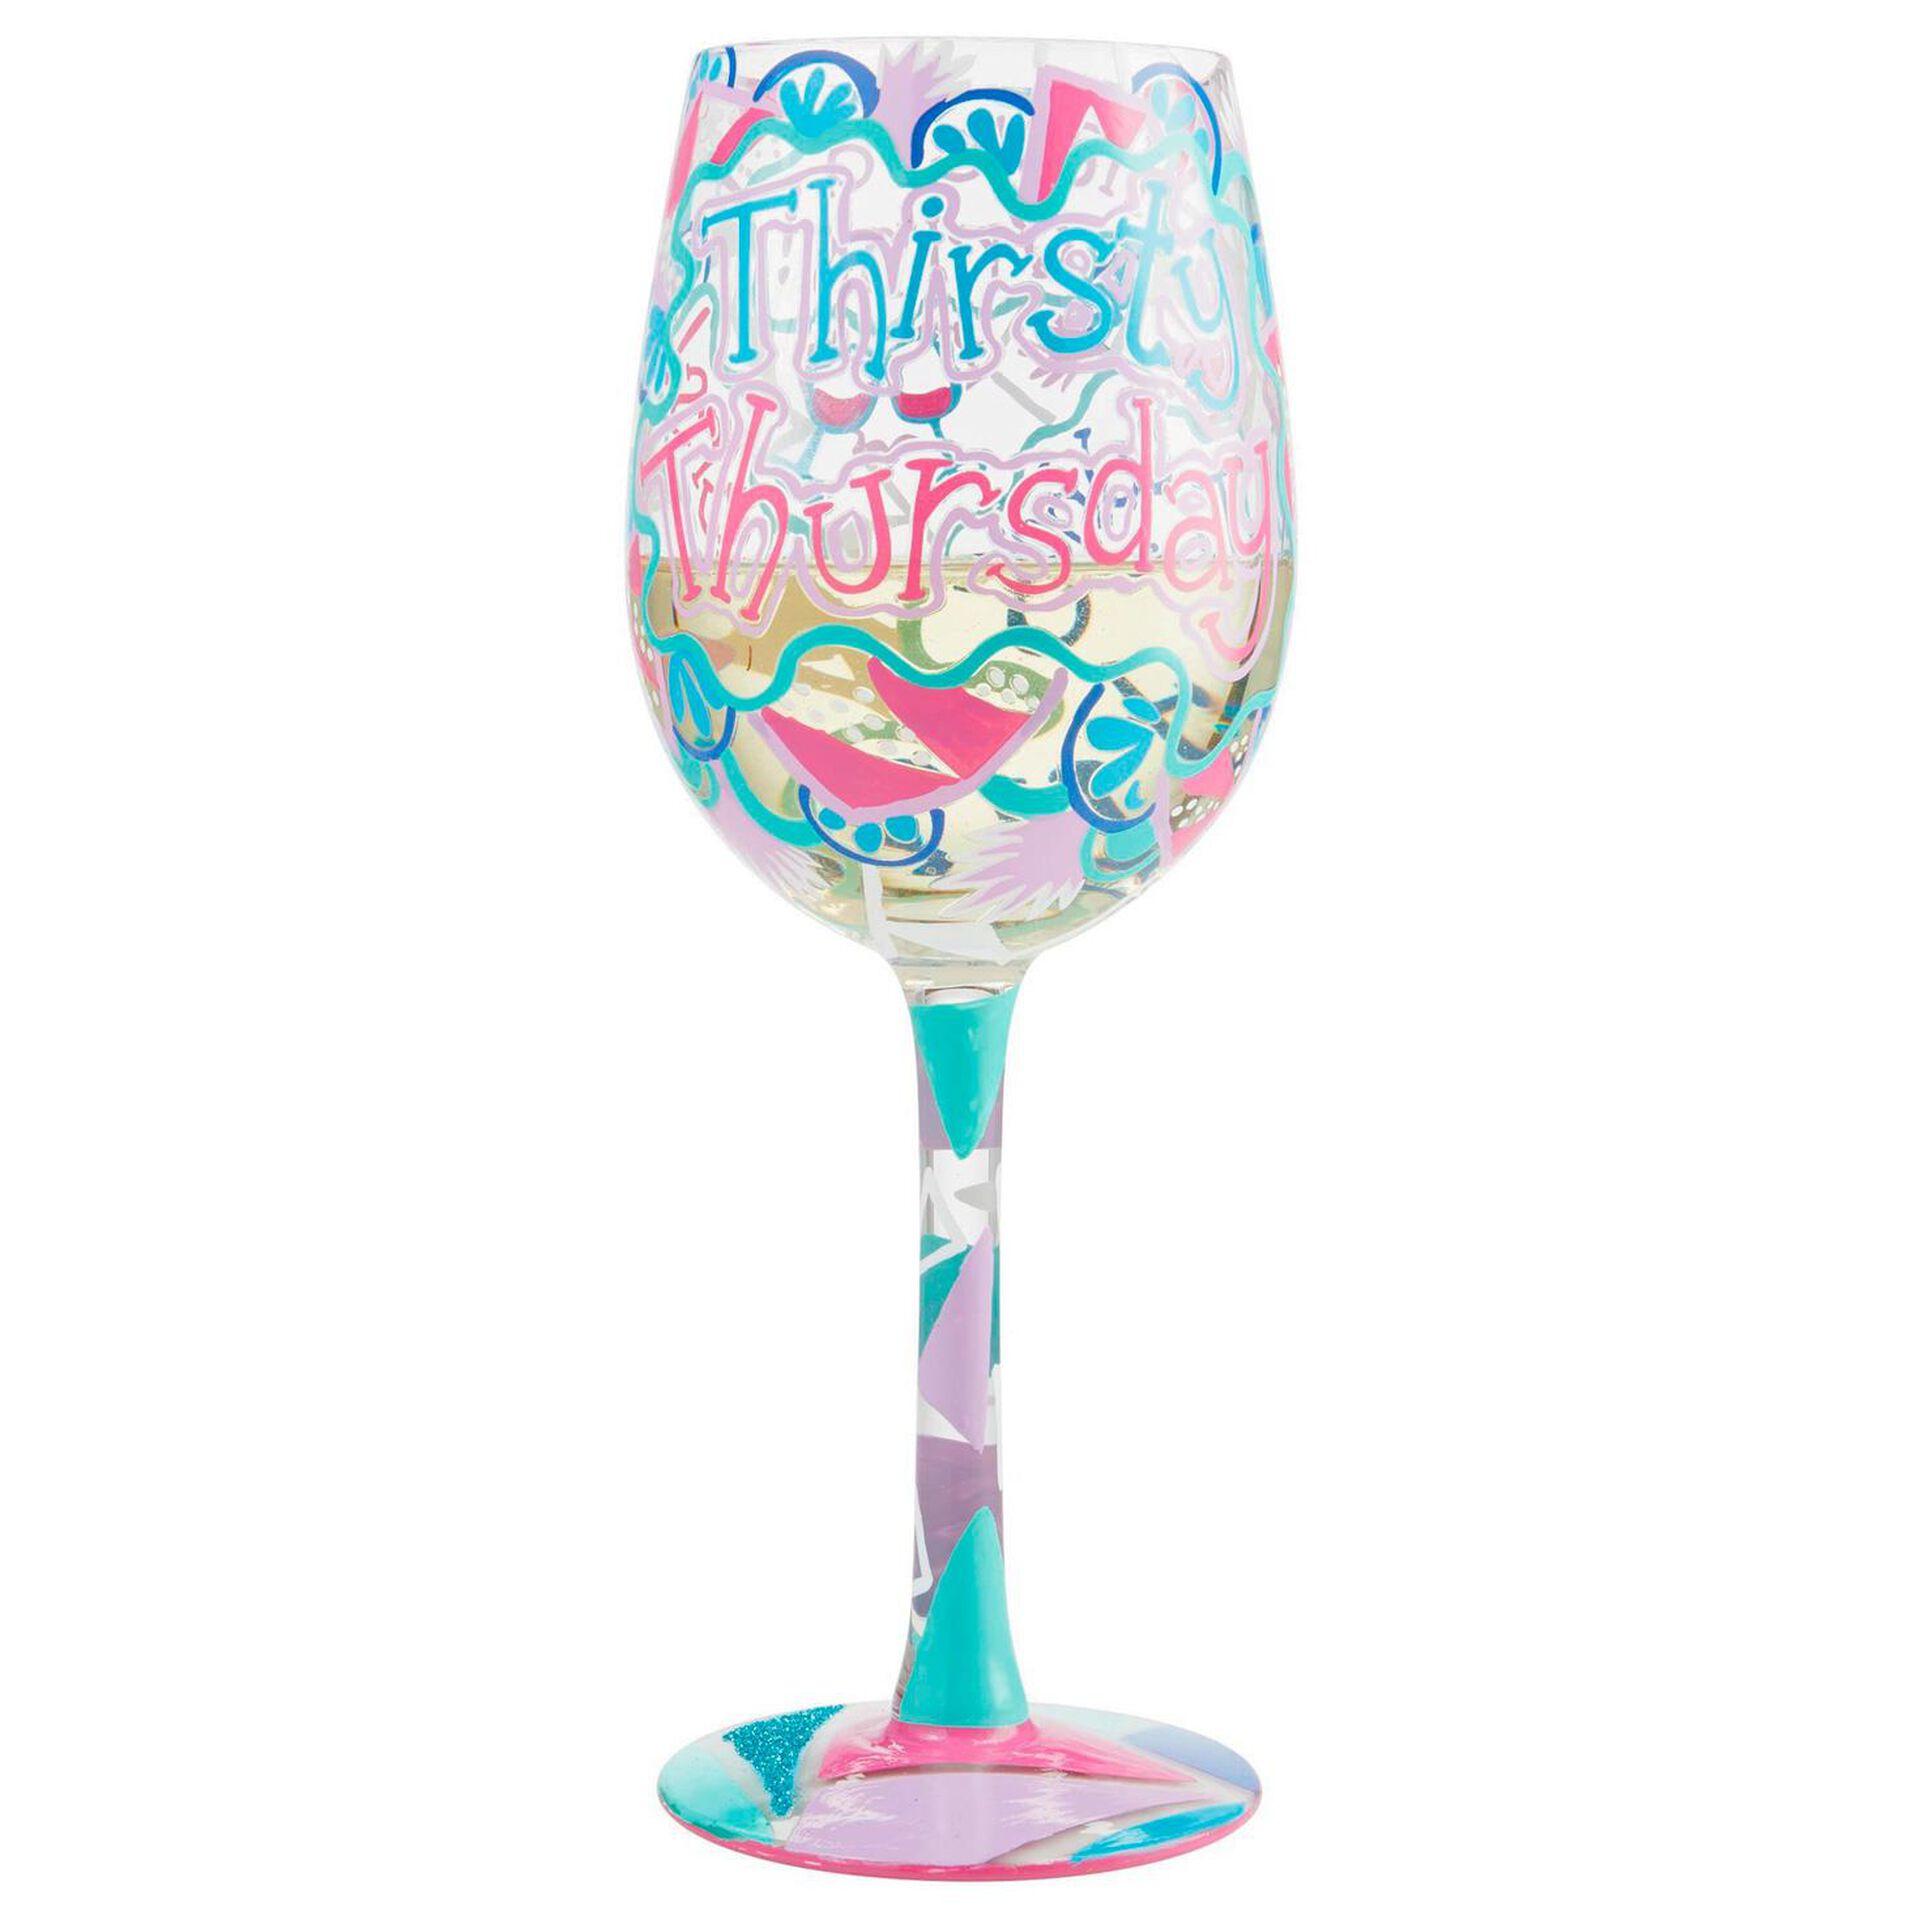 Lolita Thirsty Thursday Handpainted Wine Glass, 15 oz. - Wine Glasses -  Hallmark